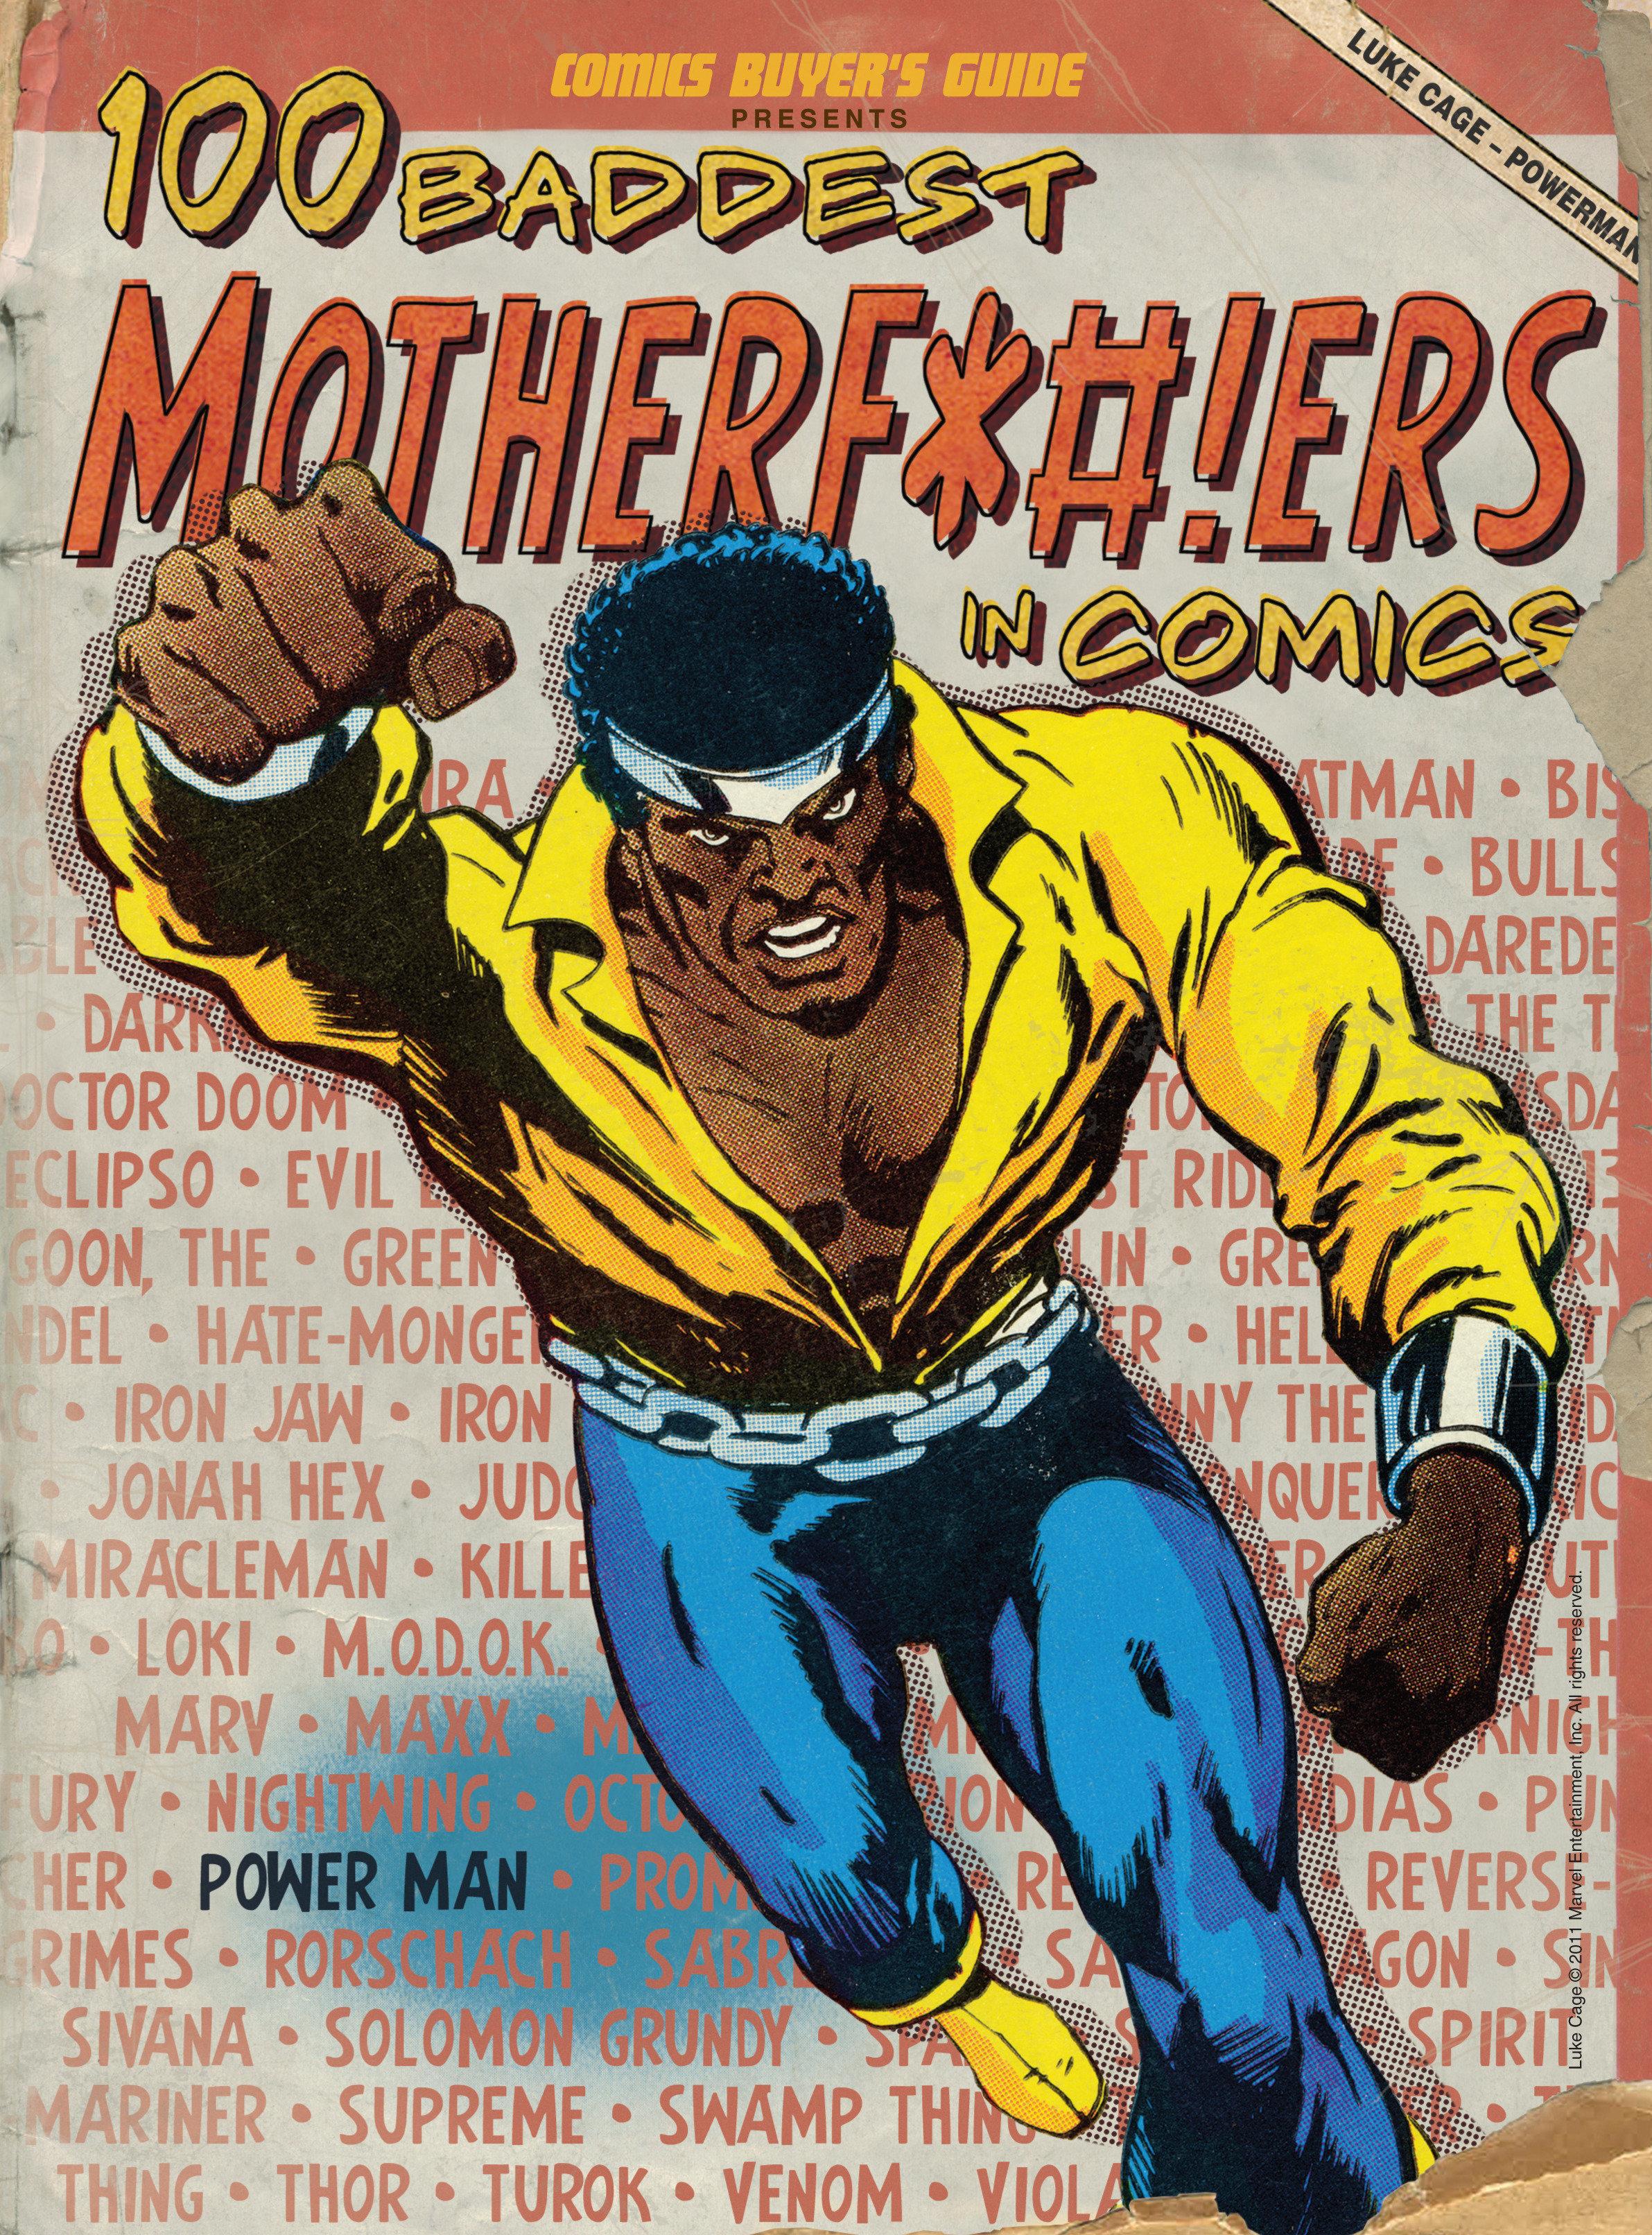 100 Baddest Mother F*ckers in Comics